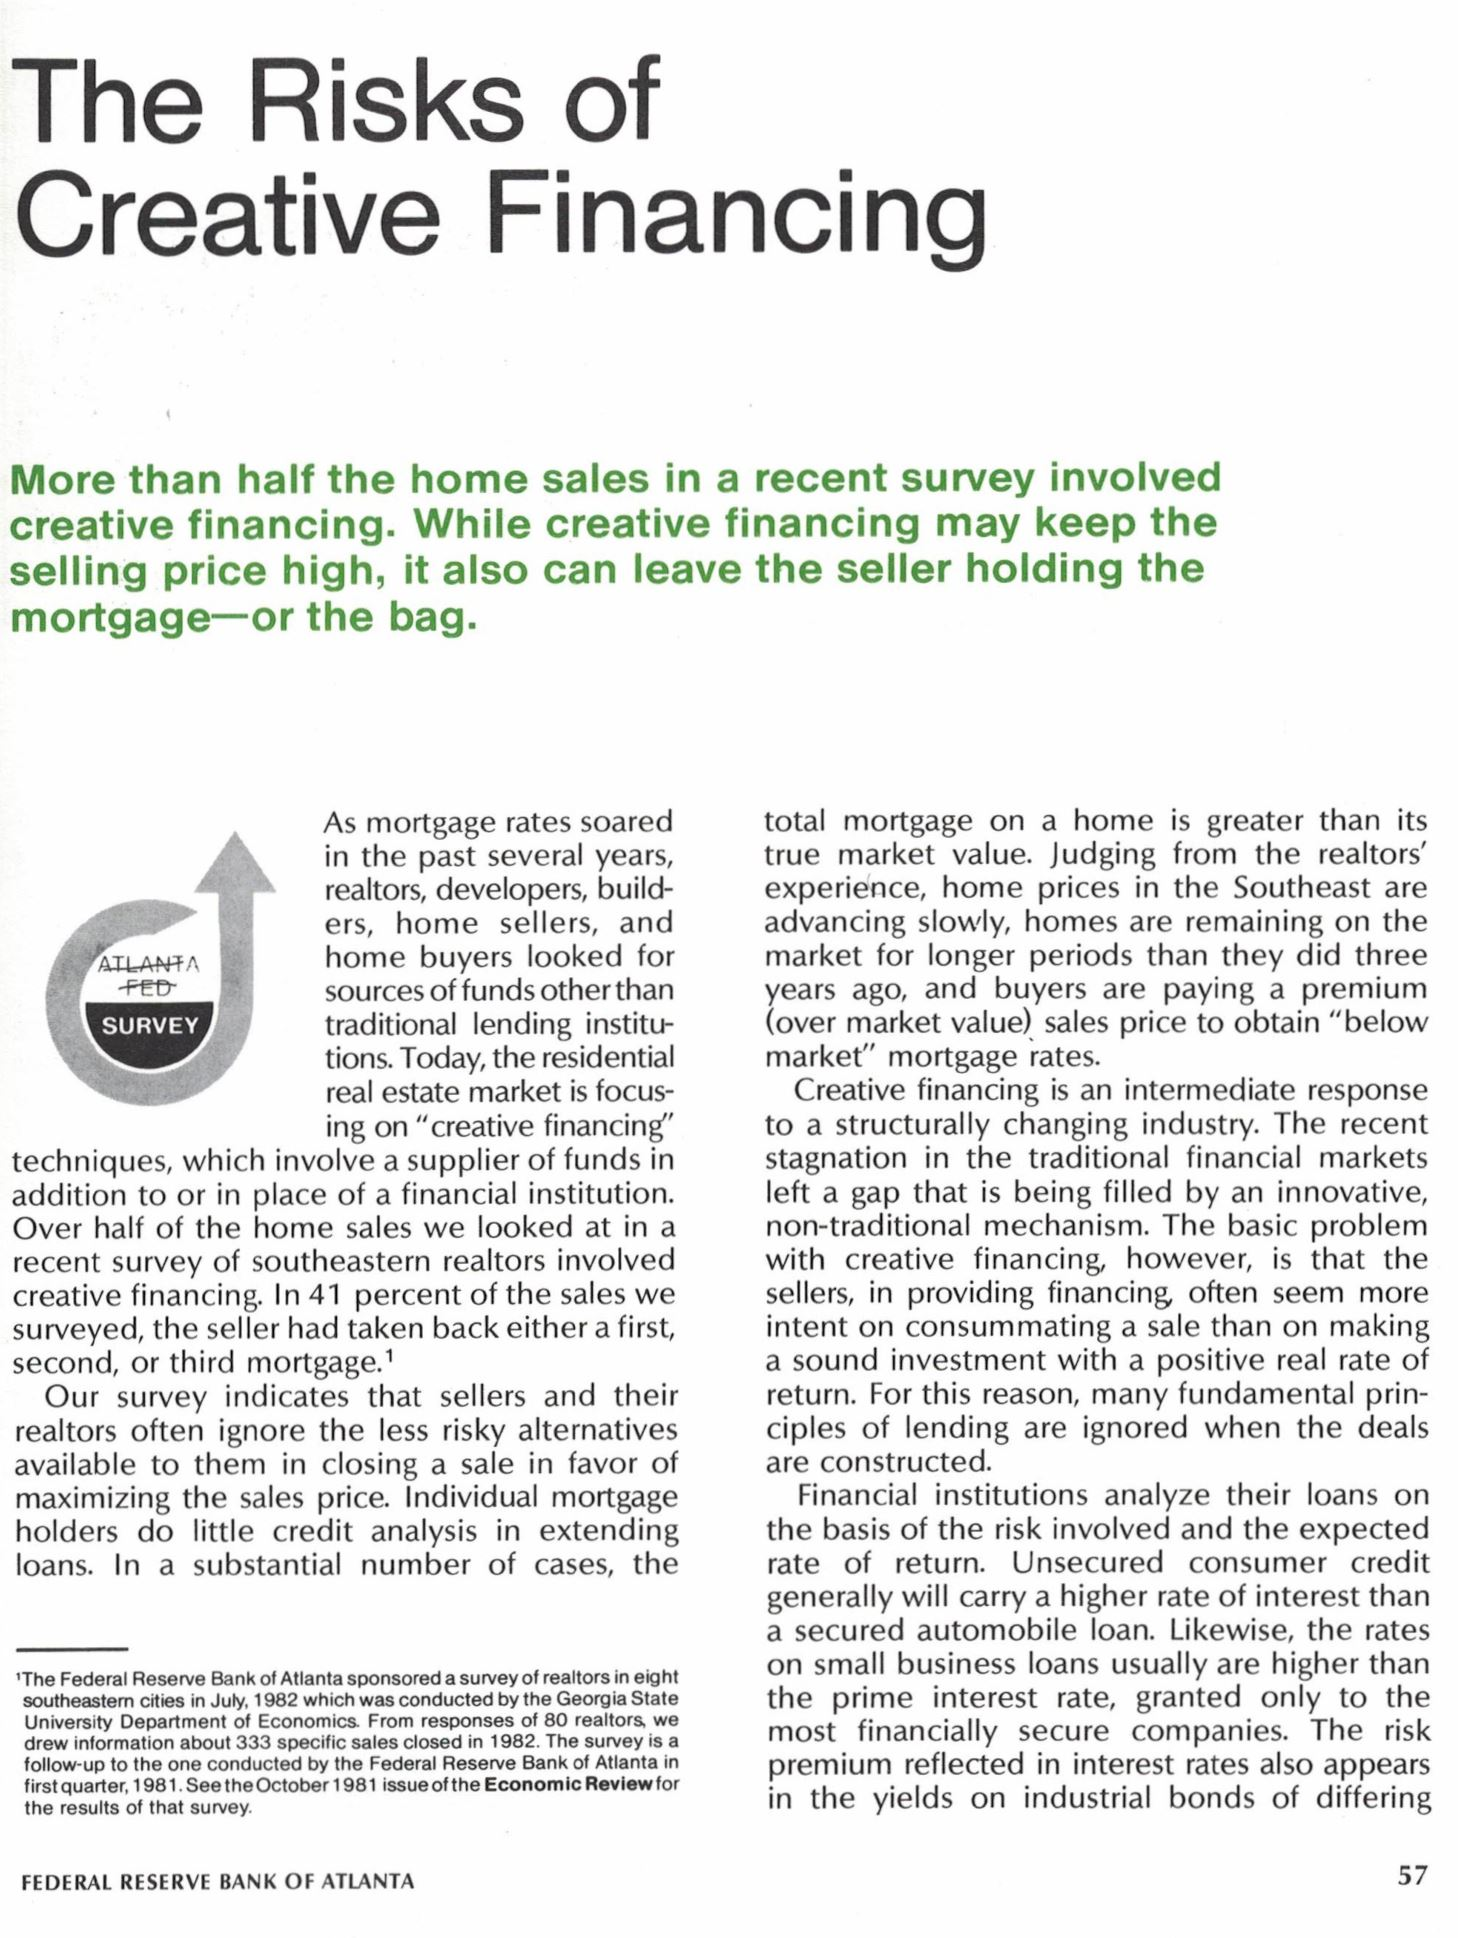 Risks-of-Creative-Financing-1.jpg